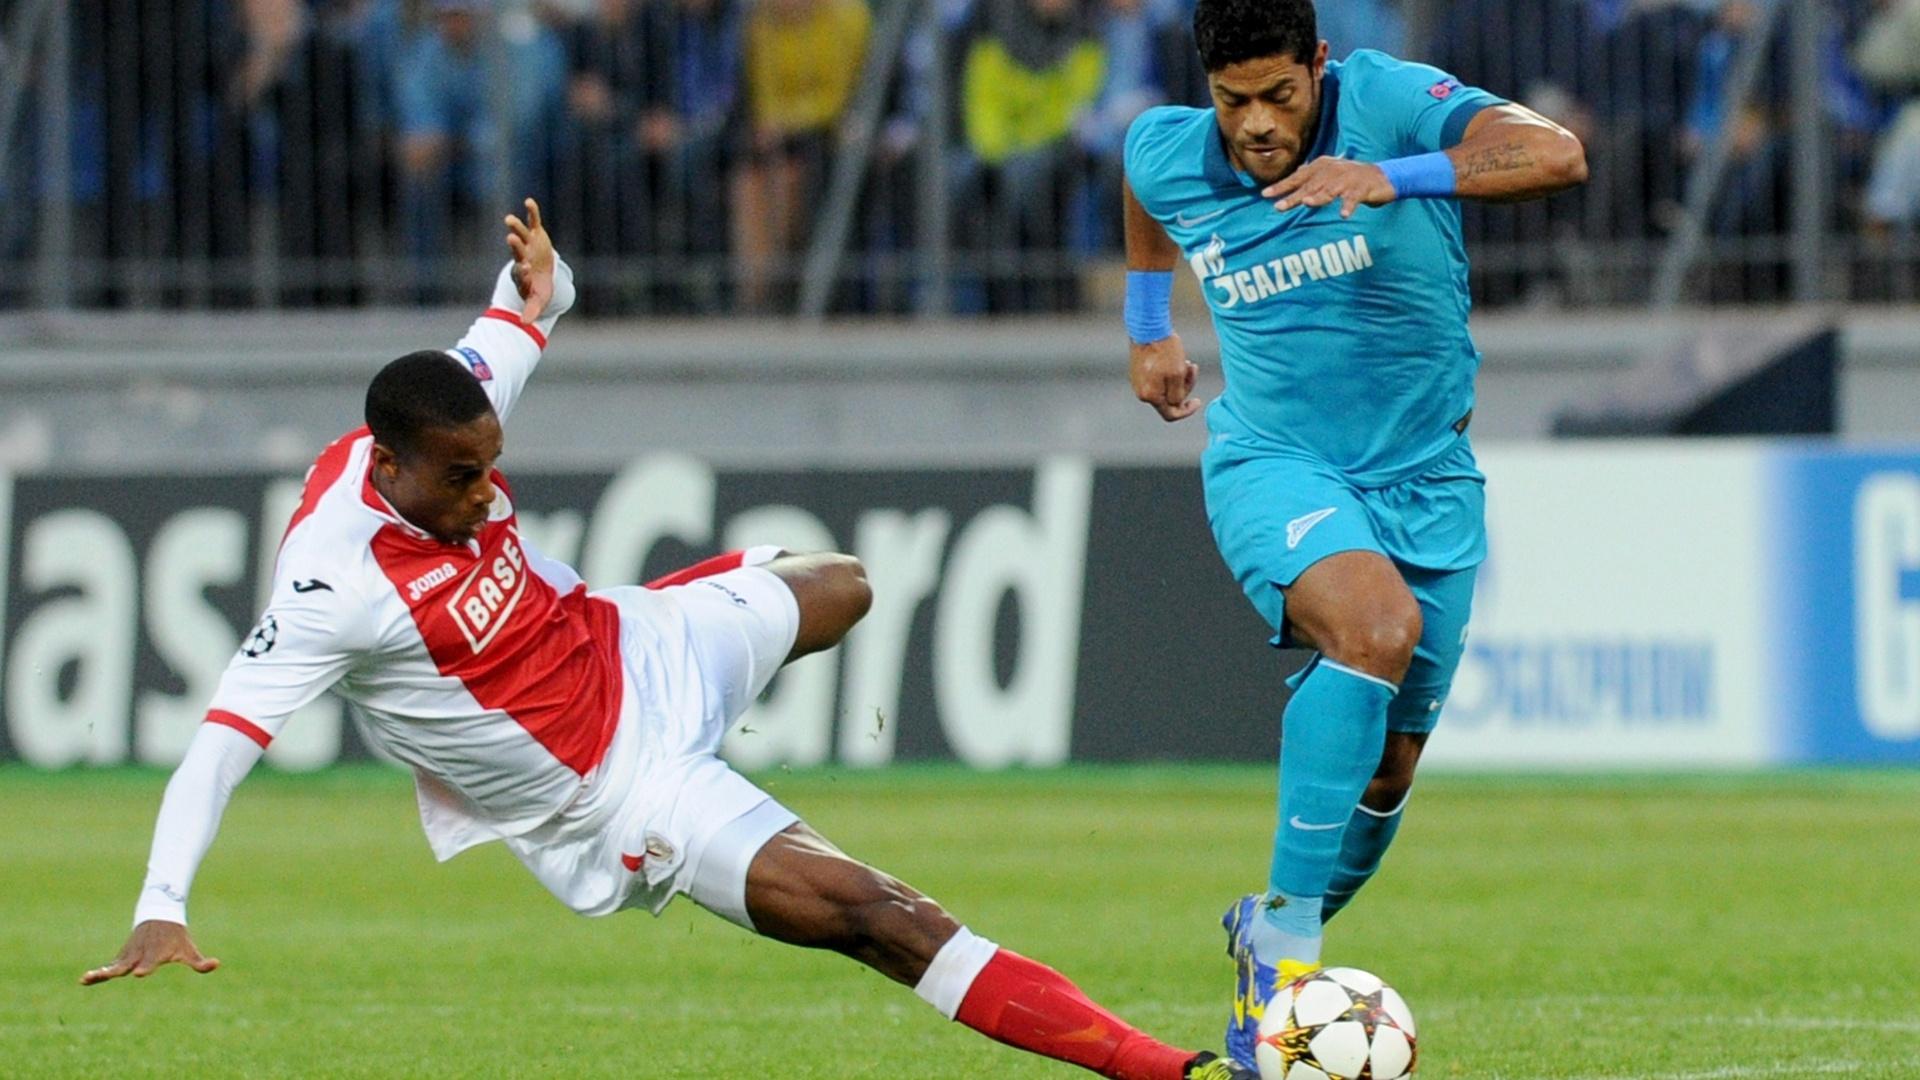 26.08.2014 - Hulk conduz a bola na vitória do Zenit contra o Standard Liege